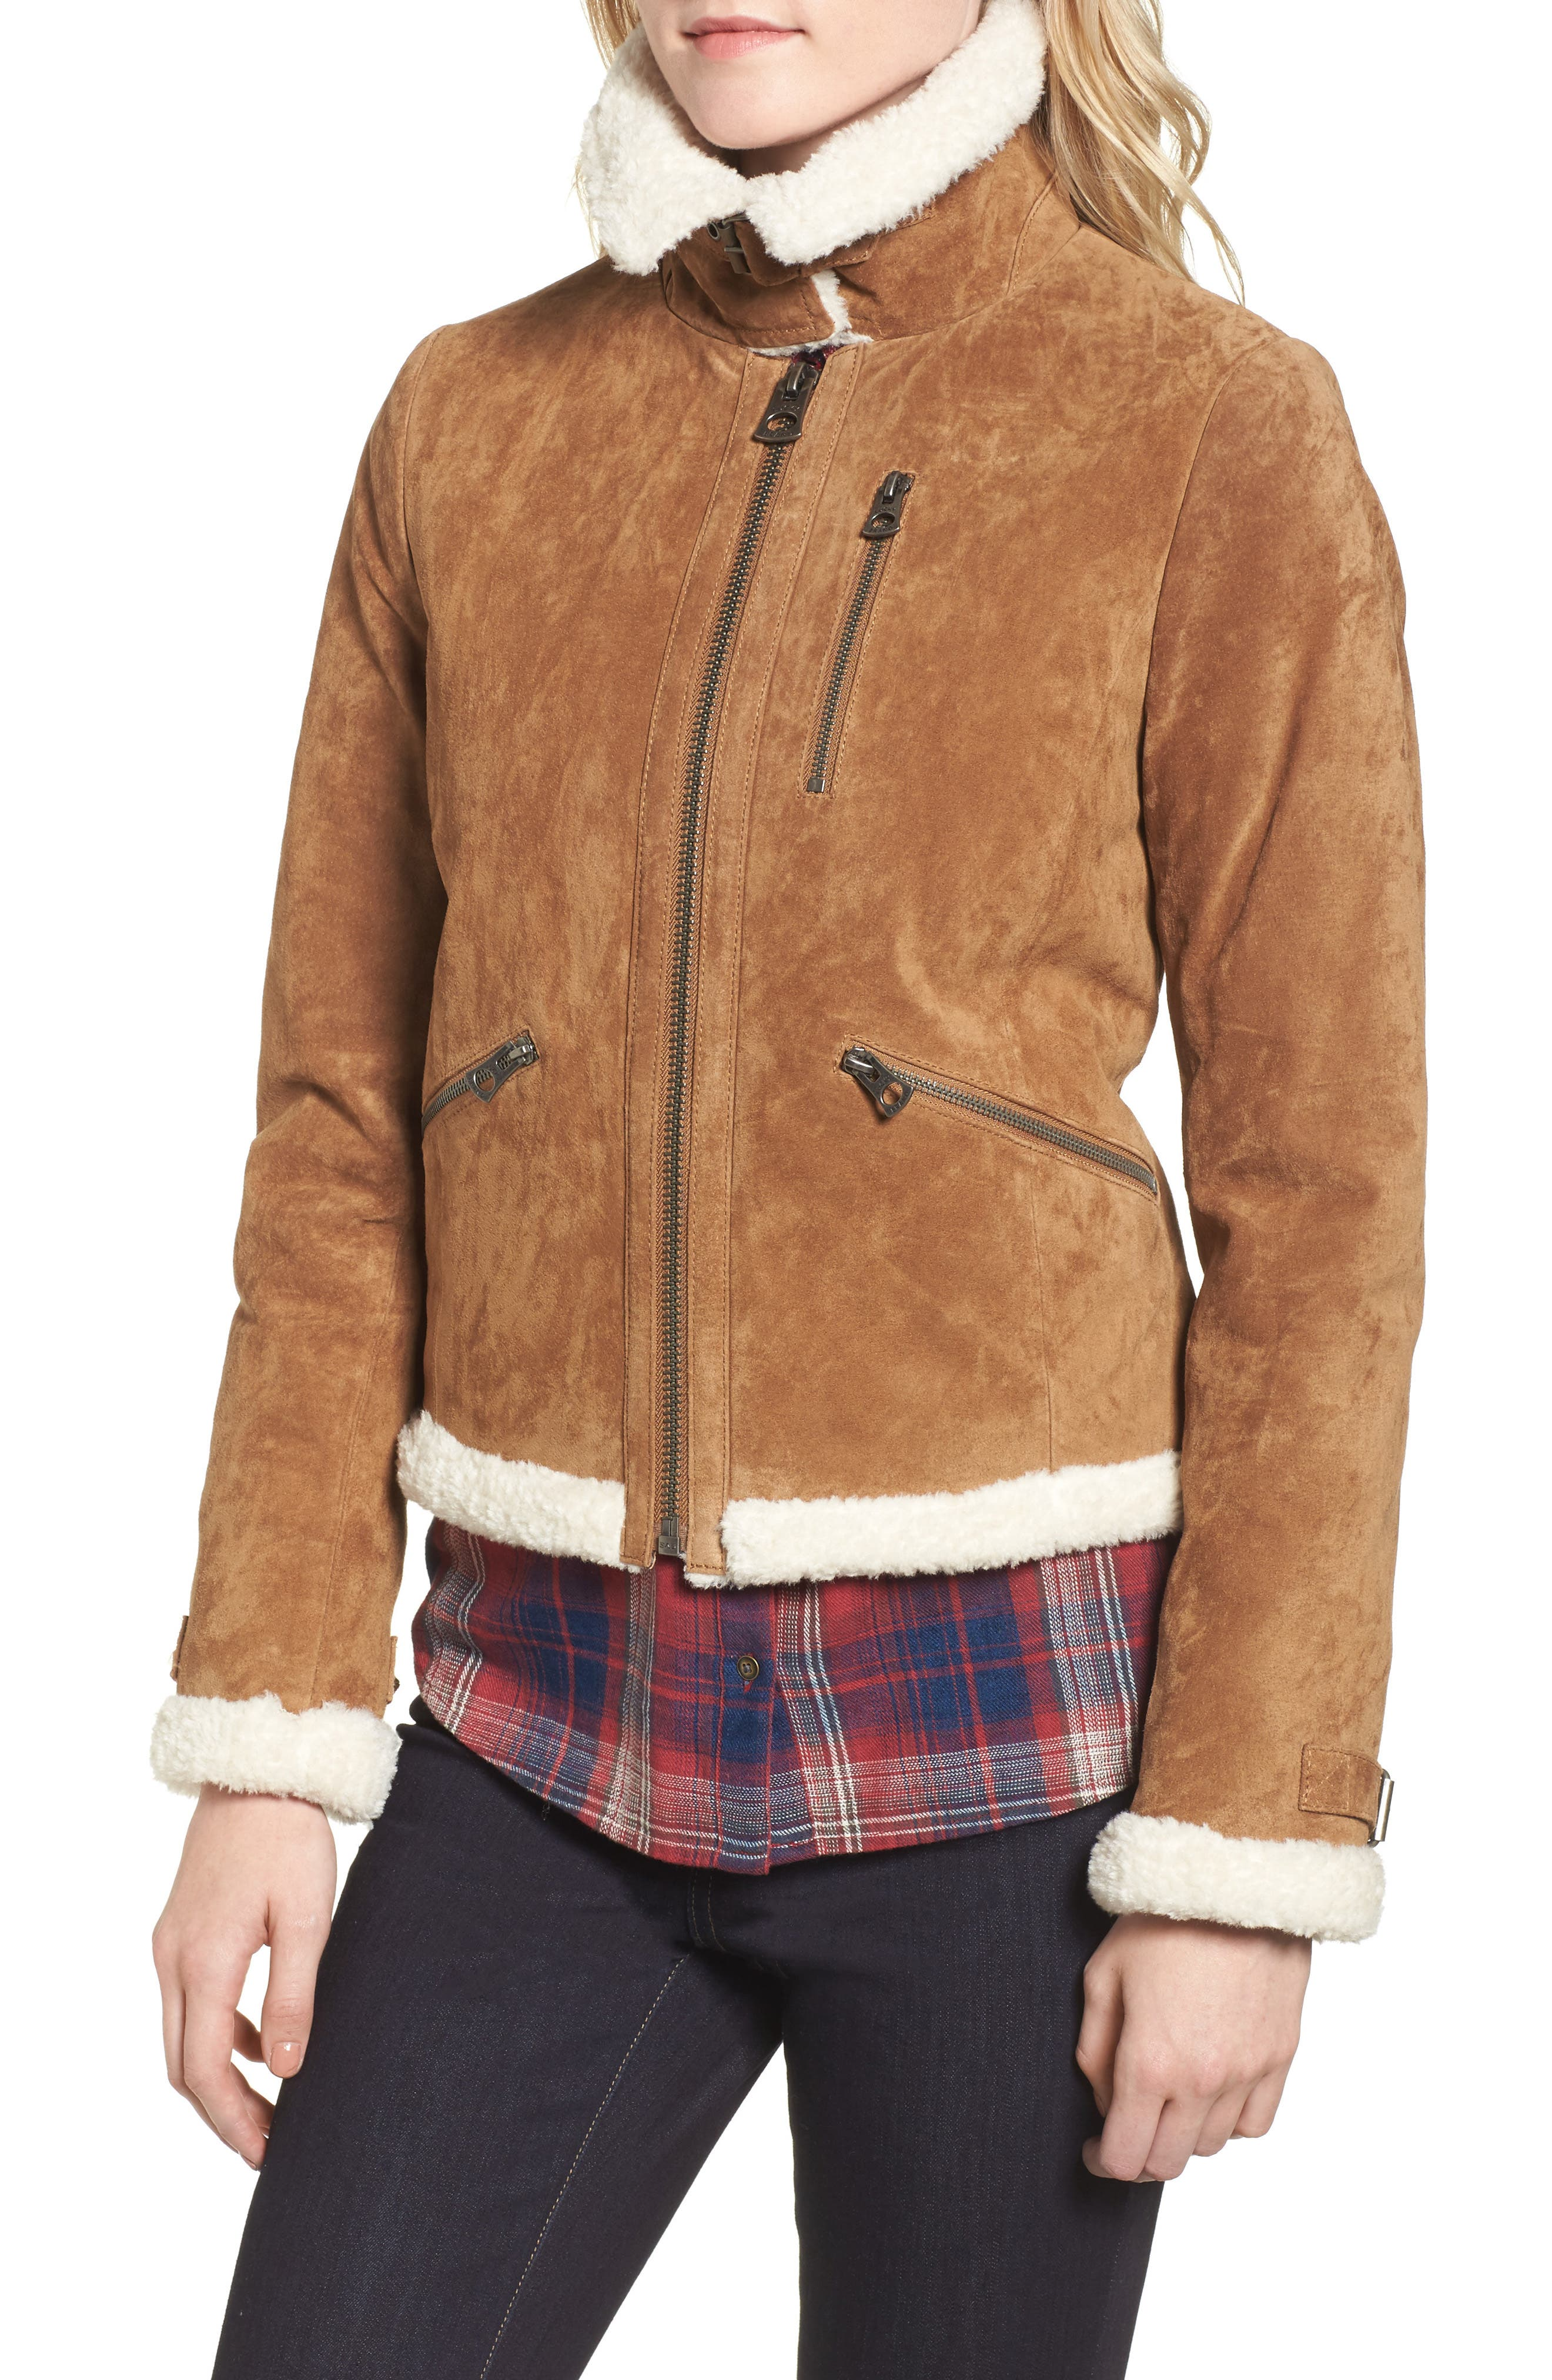 Leather Jacket with Faux Fur Trim,                             Alternate thumbnail 4, color,                             235